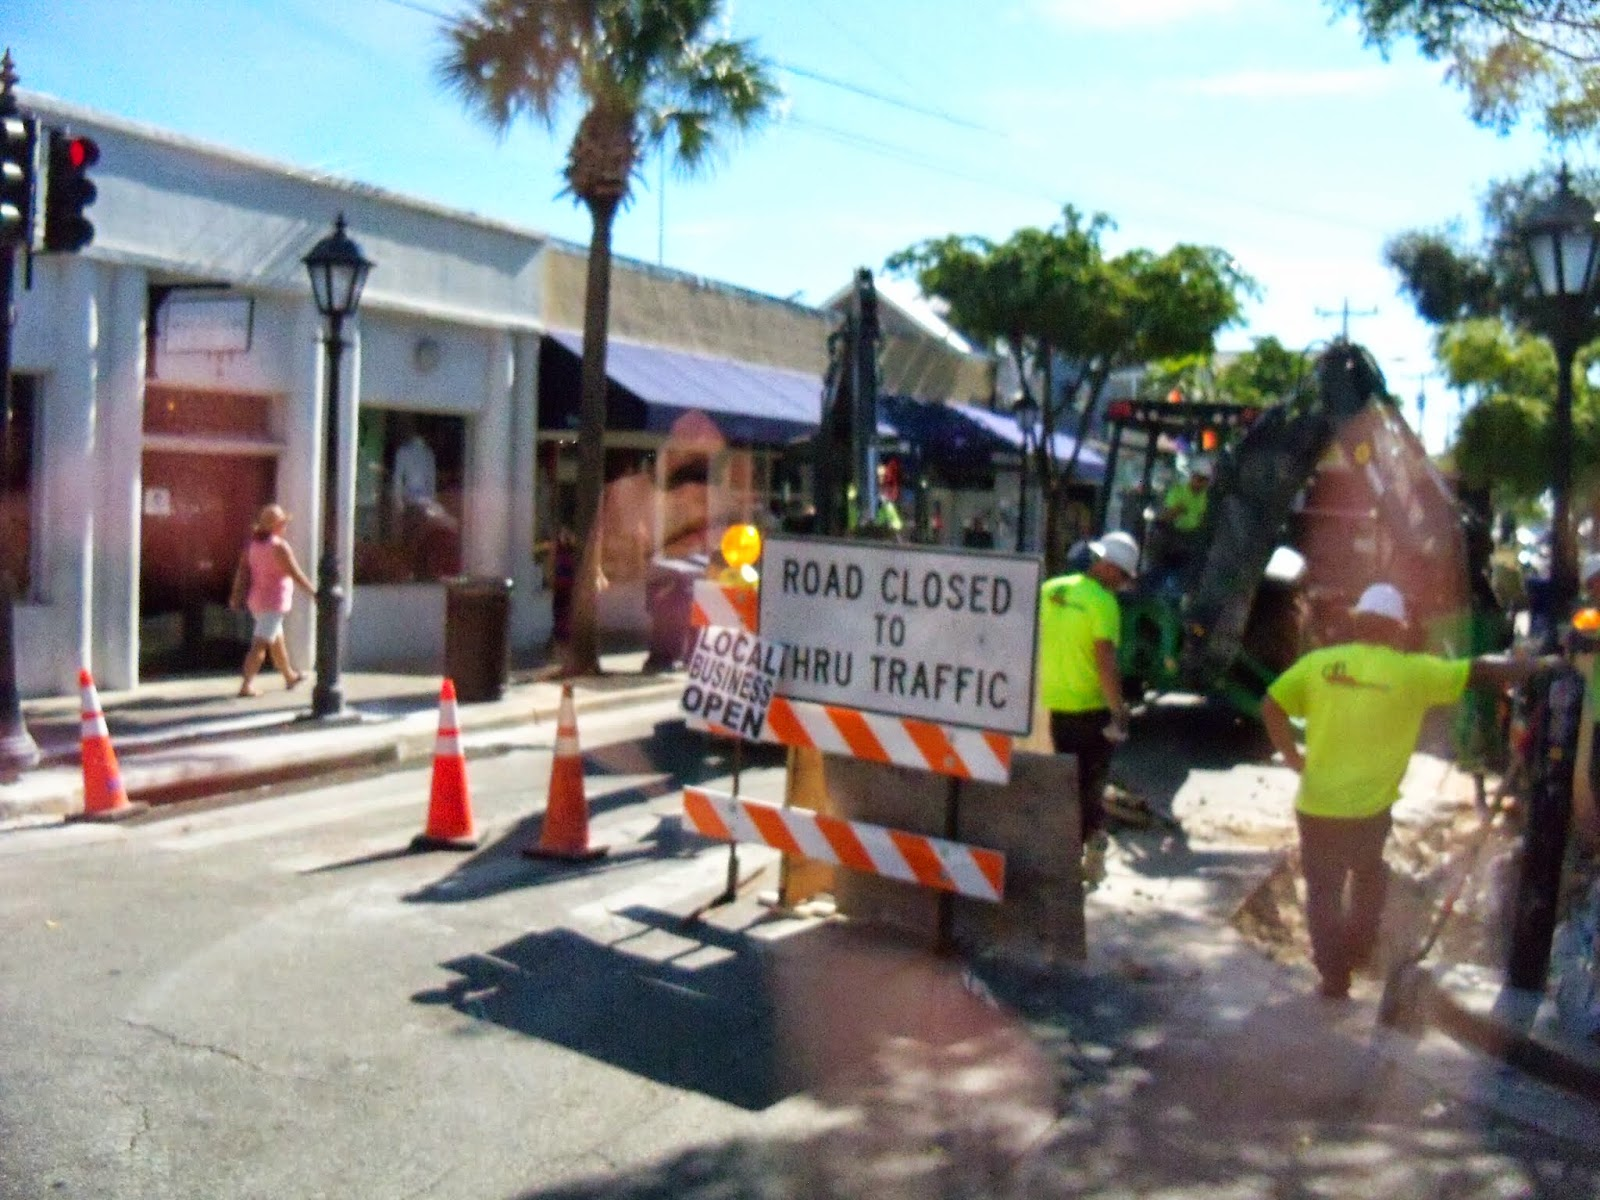 Key West Vacation - 116_5736.JPG